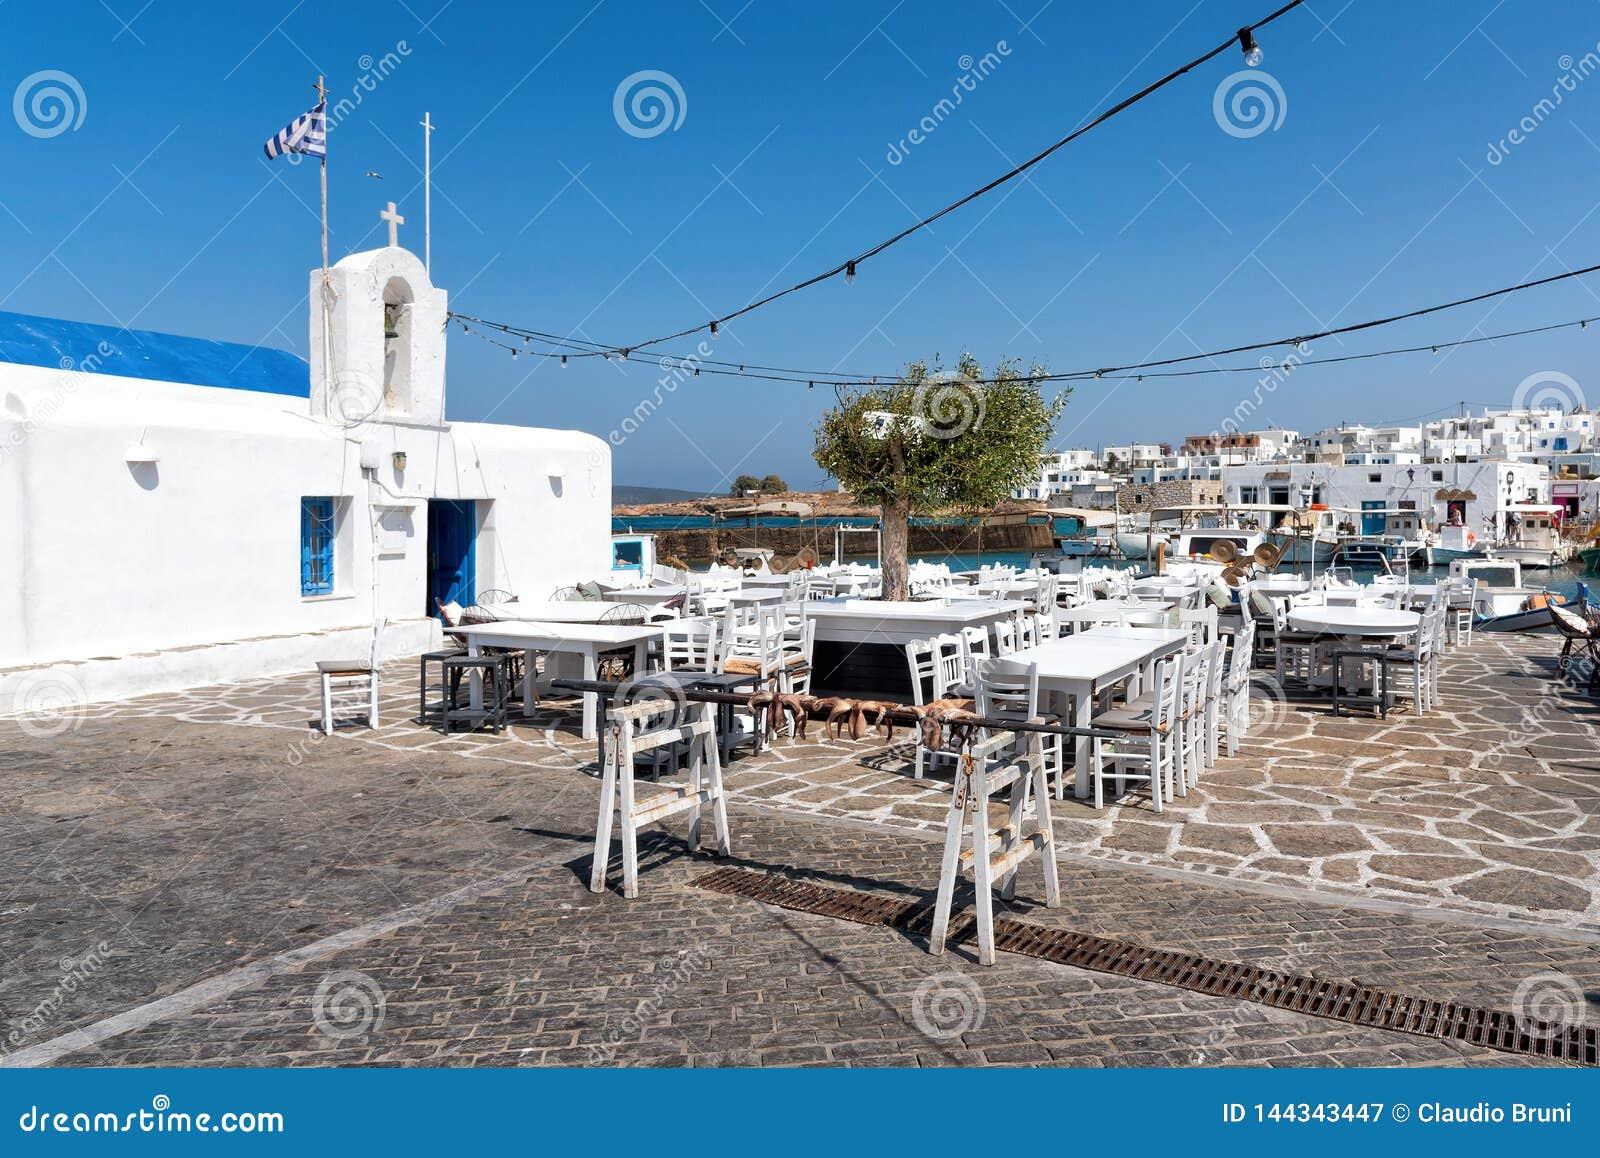 Naoussa - Paros Cyclades island - Aegean sea - Greece